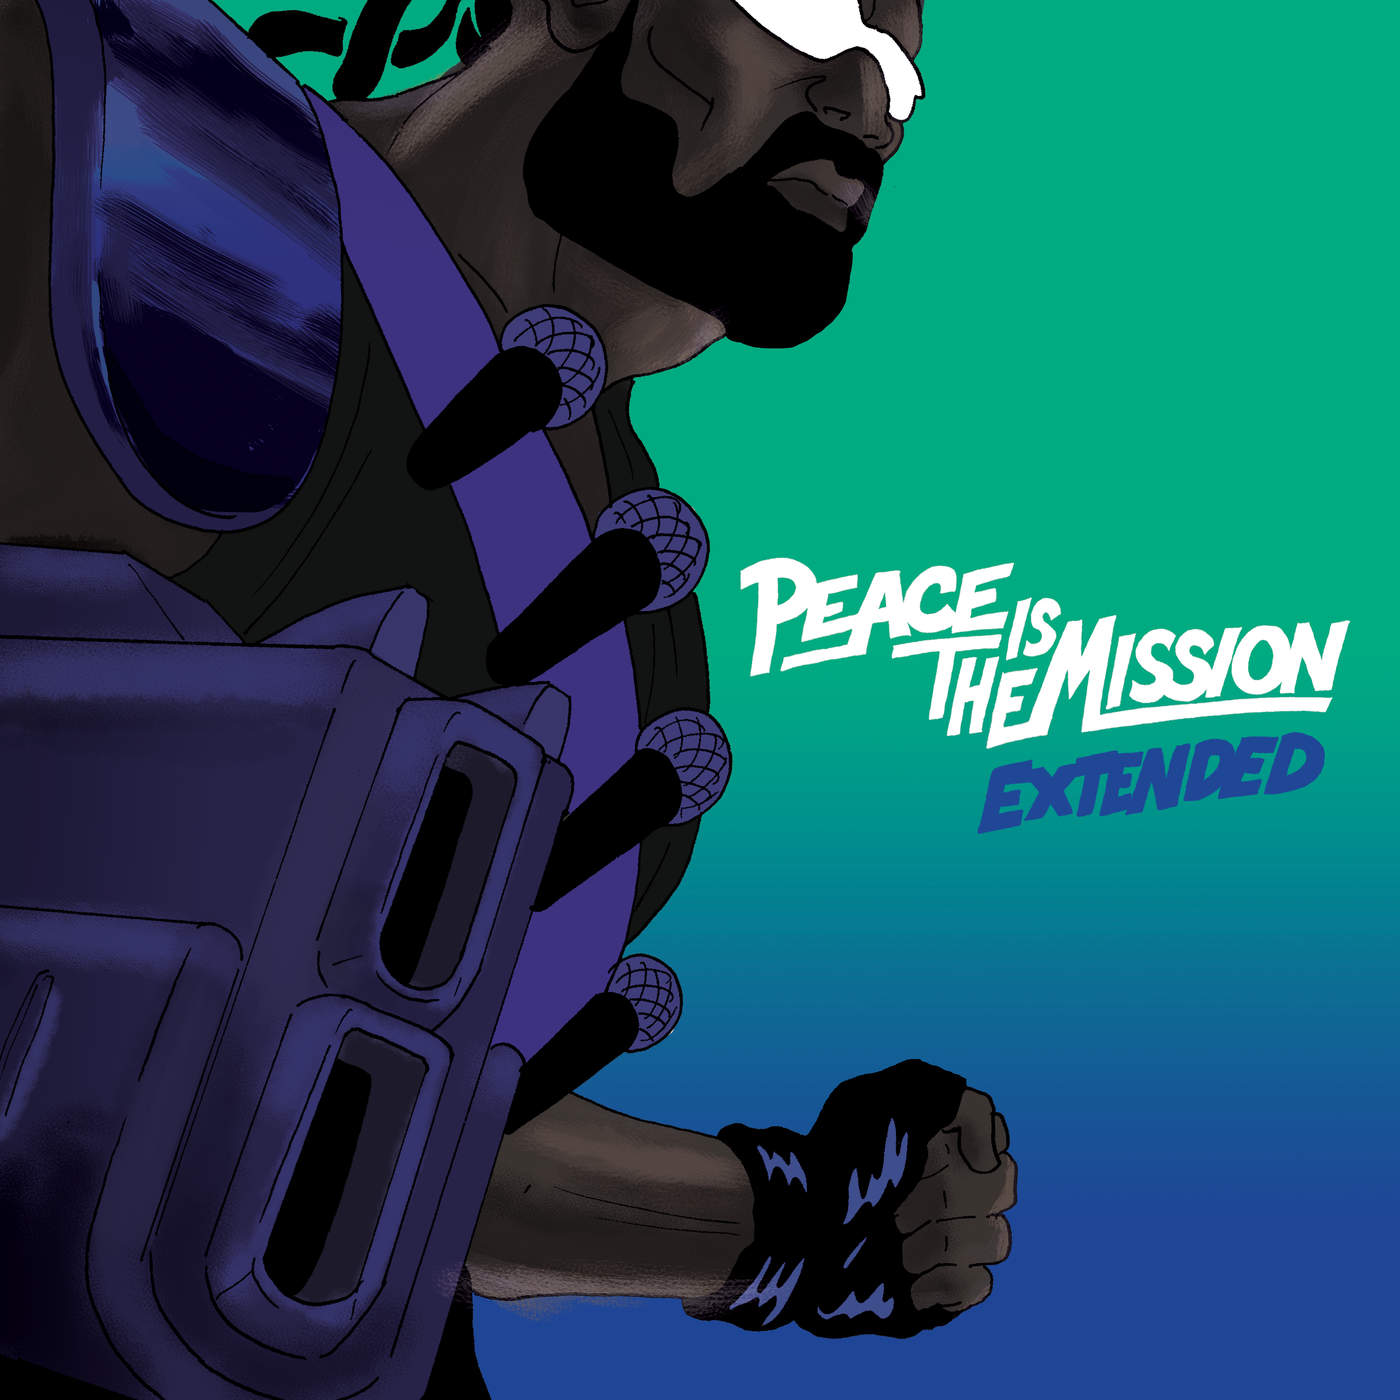 Major Lazer - Light It Up (feat. Nyla & Fuse ODG) [Remix] - Single Cover